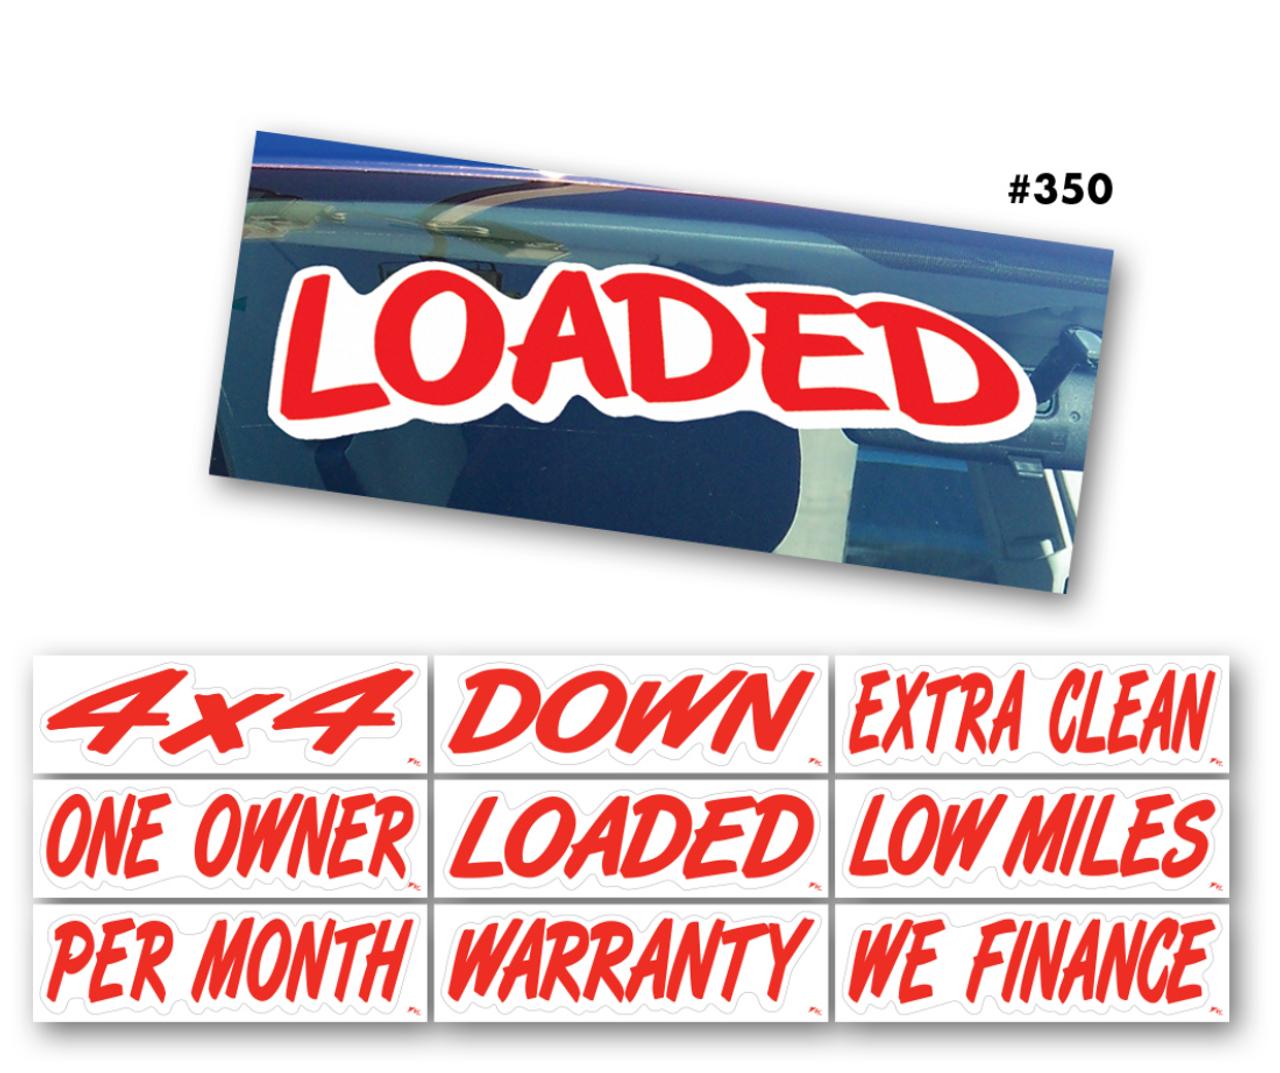 A-PEEL Auto Sign Slogans